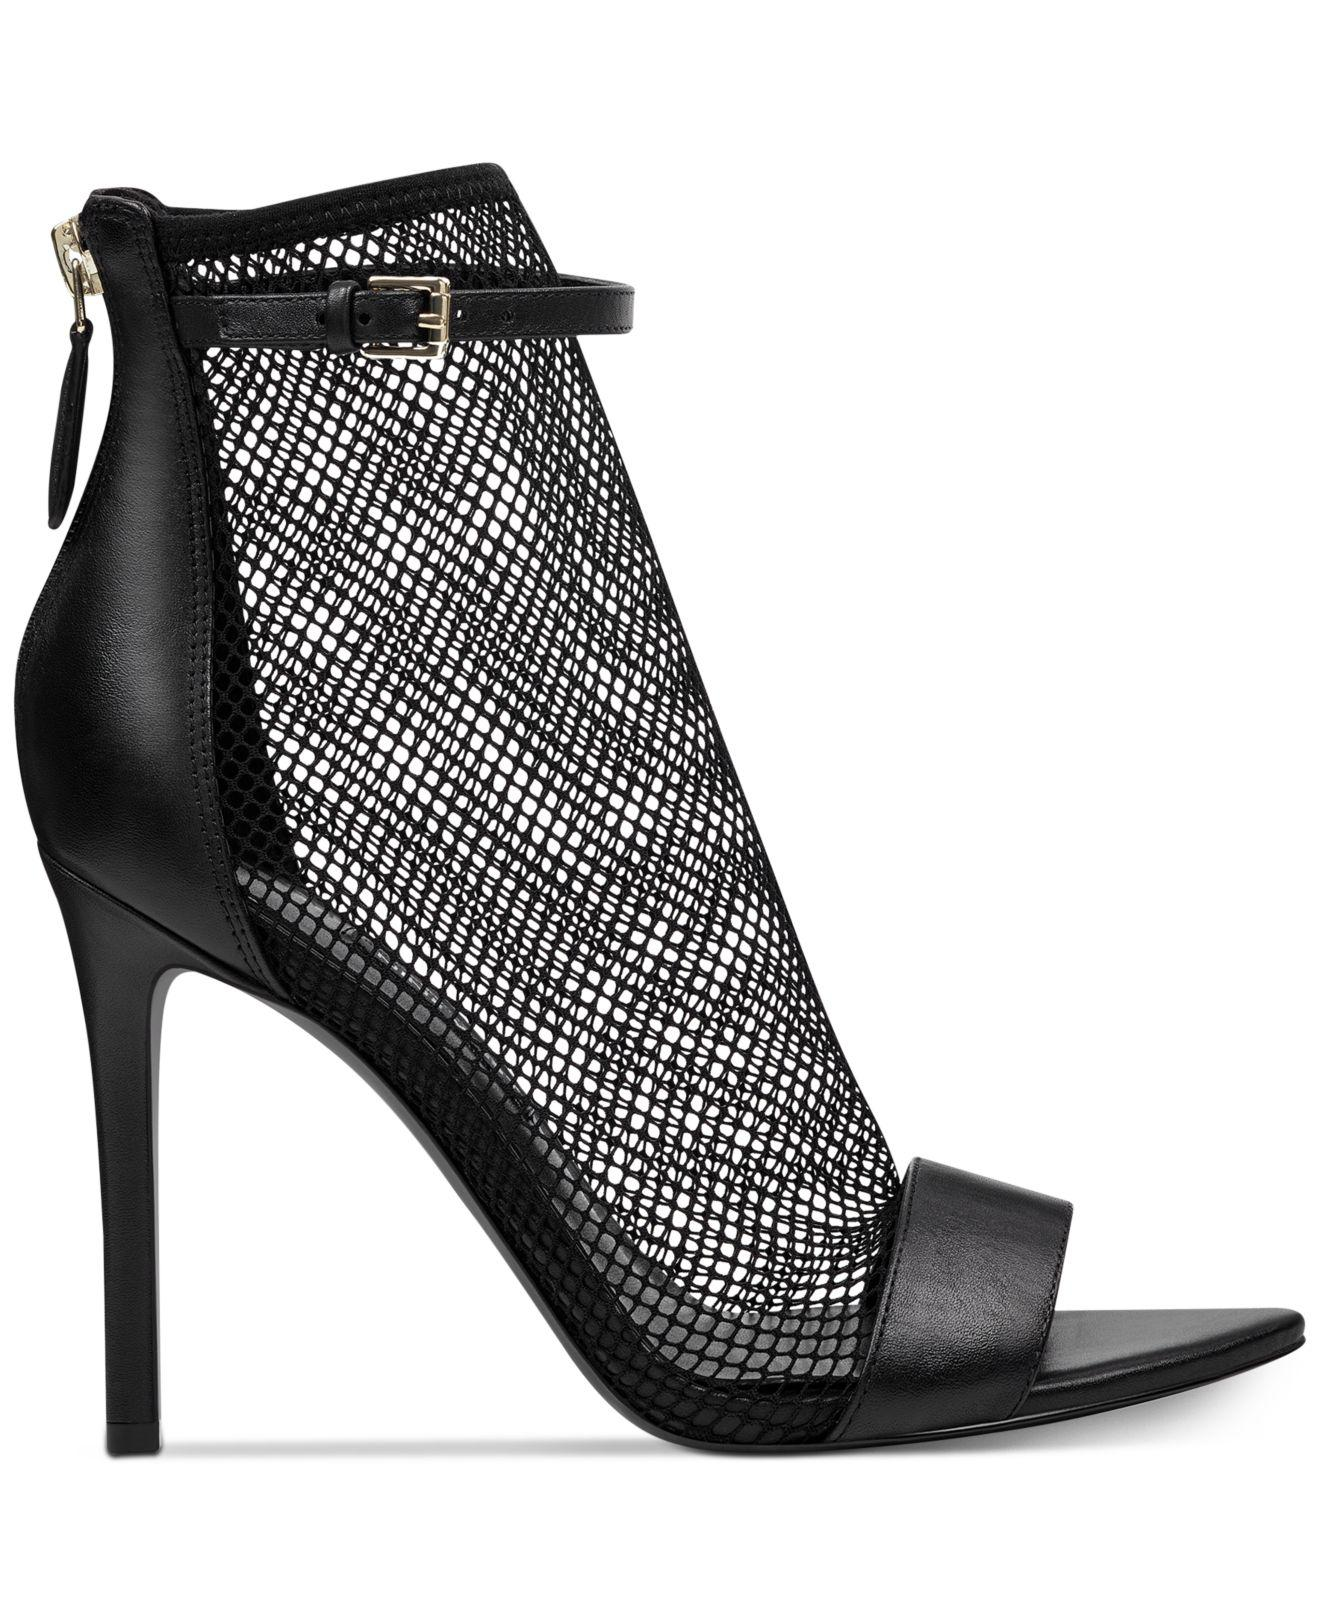 e07818a3bdb Lyst - Nine West Gotbank Mesh Dress Sandals in Black - Save 61%